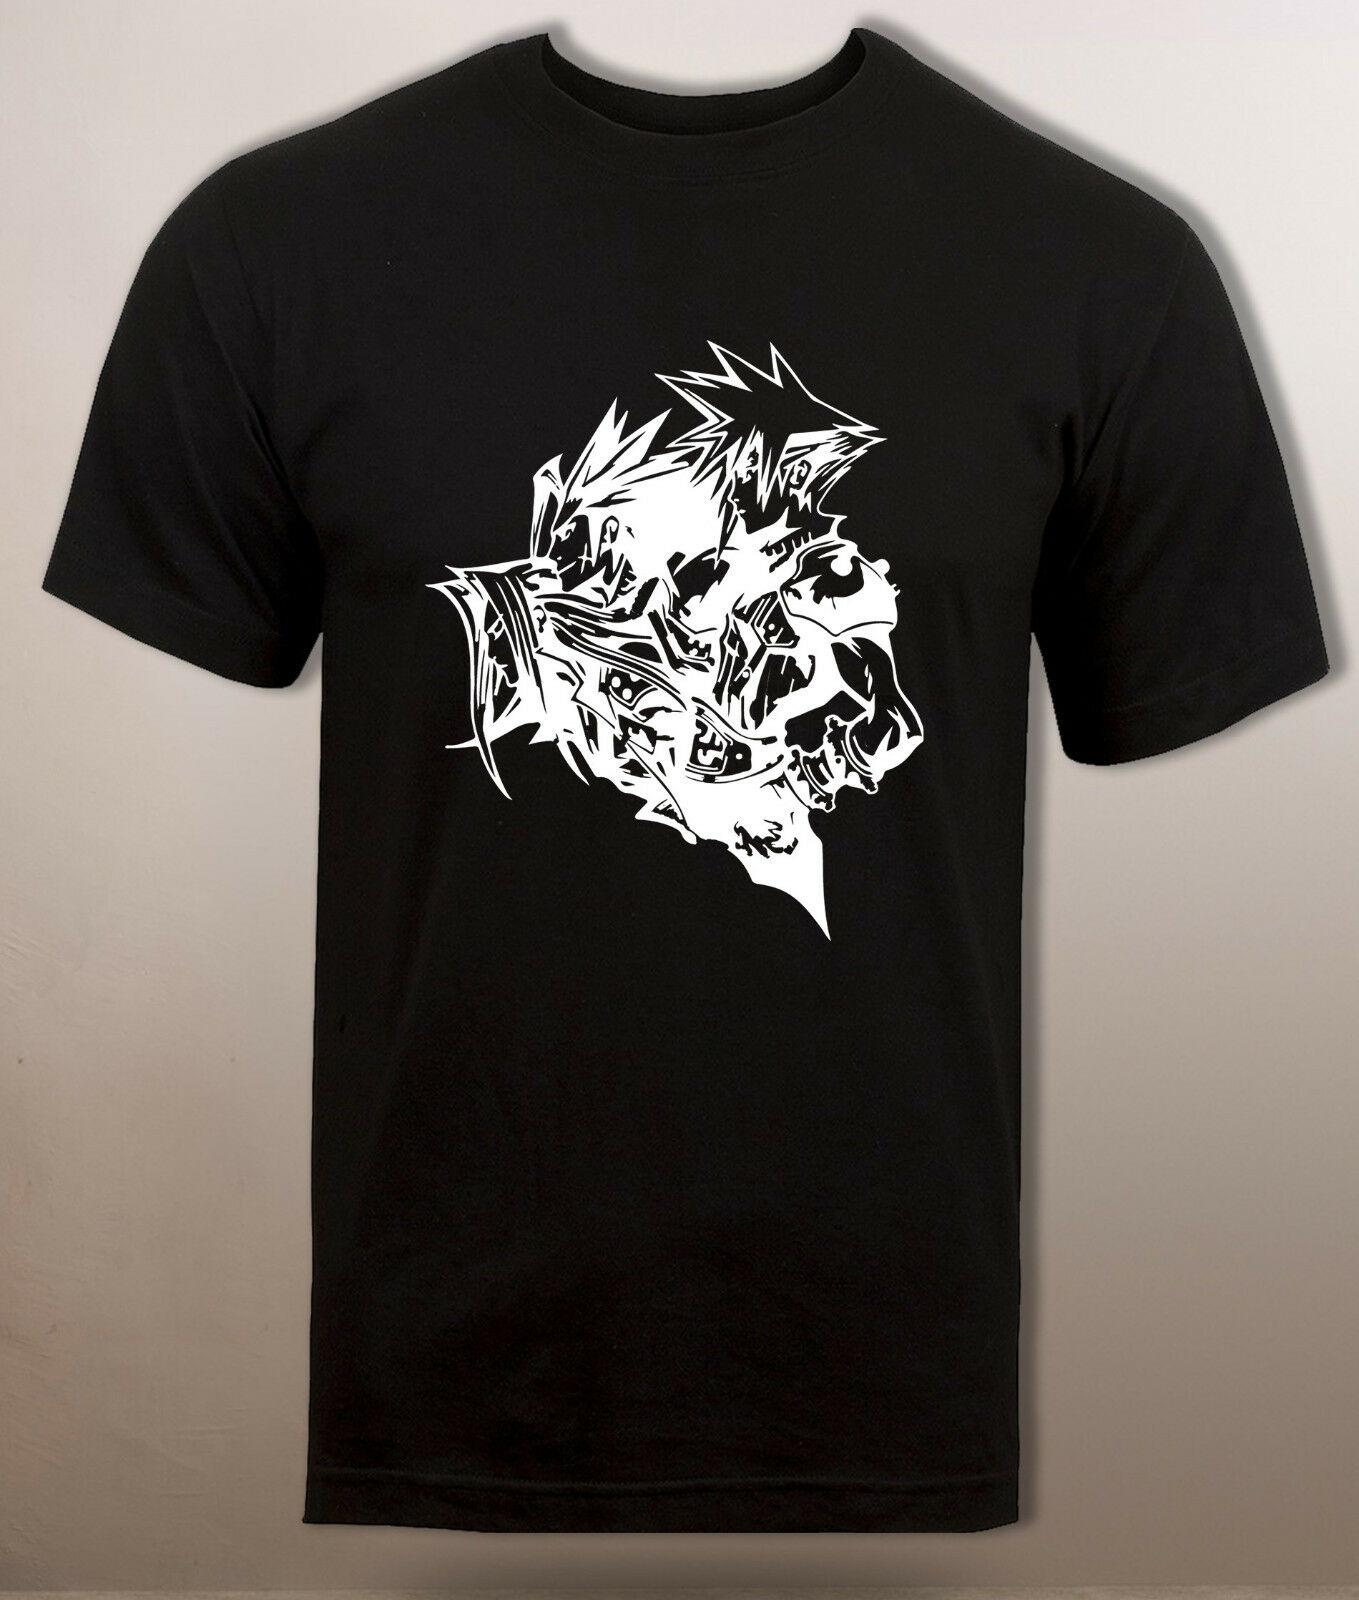 Final Fantasy 7 t shirt, Sephiroth, Zack Fair, Cloud Strife cool t shirt FF7 Cool Casual pride t shirt men Unisex Fashion tshirt